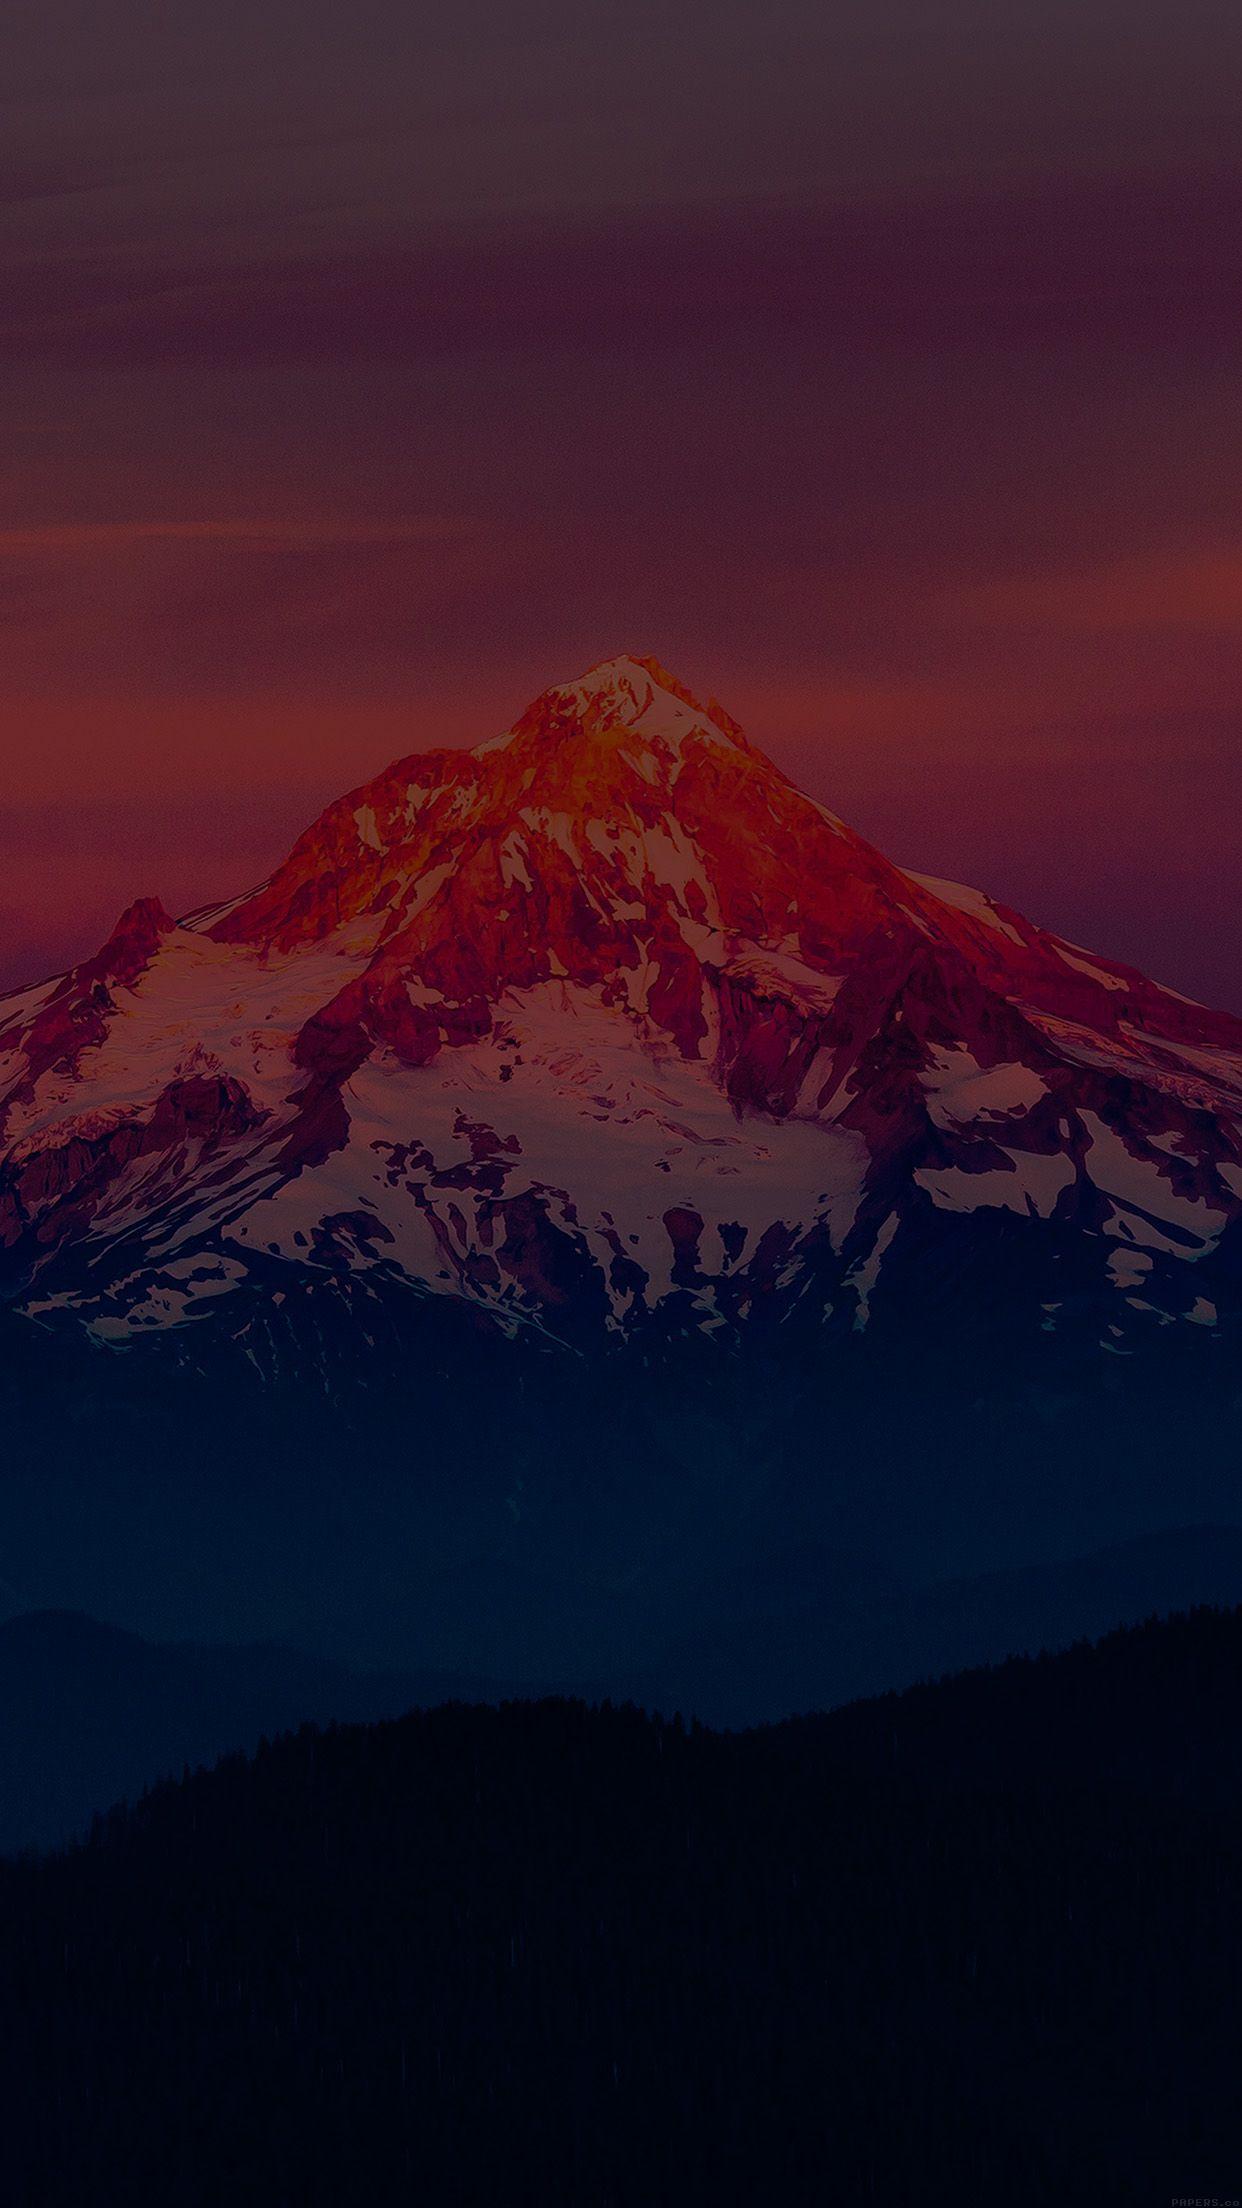 Cool Wallpaper Mountain Dark - feafe04ac50b90bde2c20621435da141  2018_75904.jpg